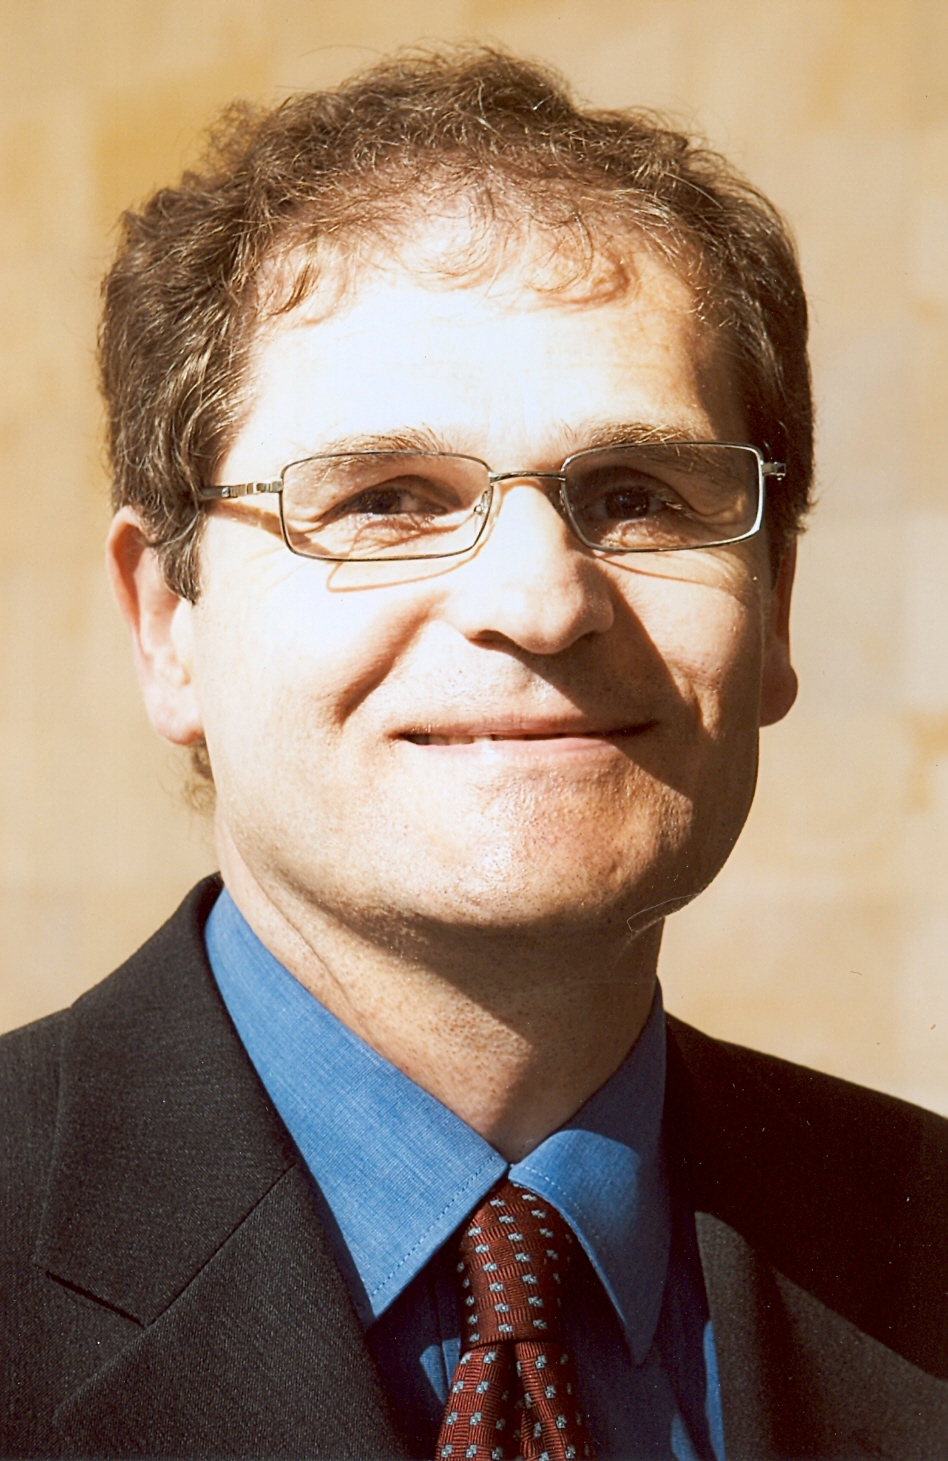 Prof. Laszlo Herszenyi